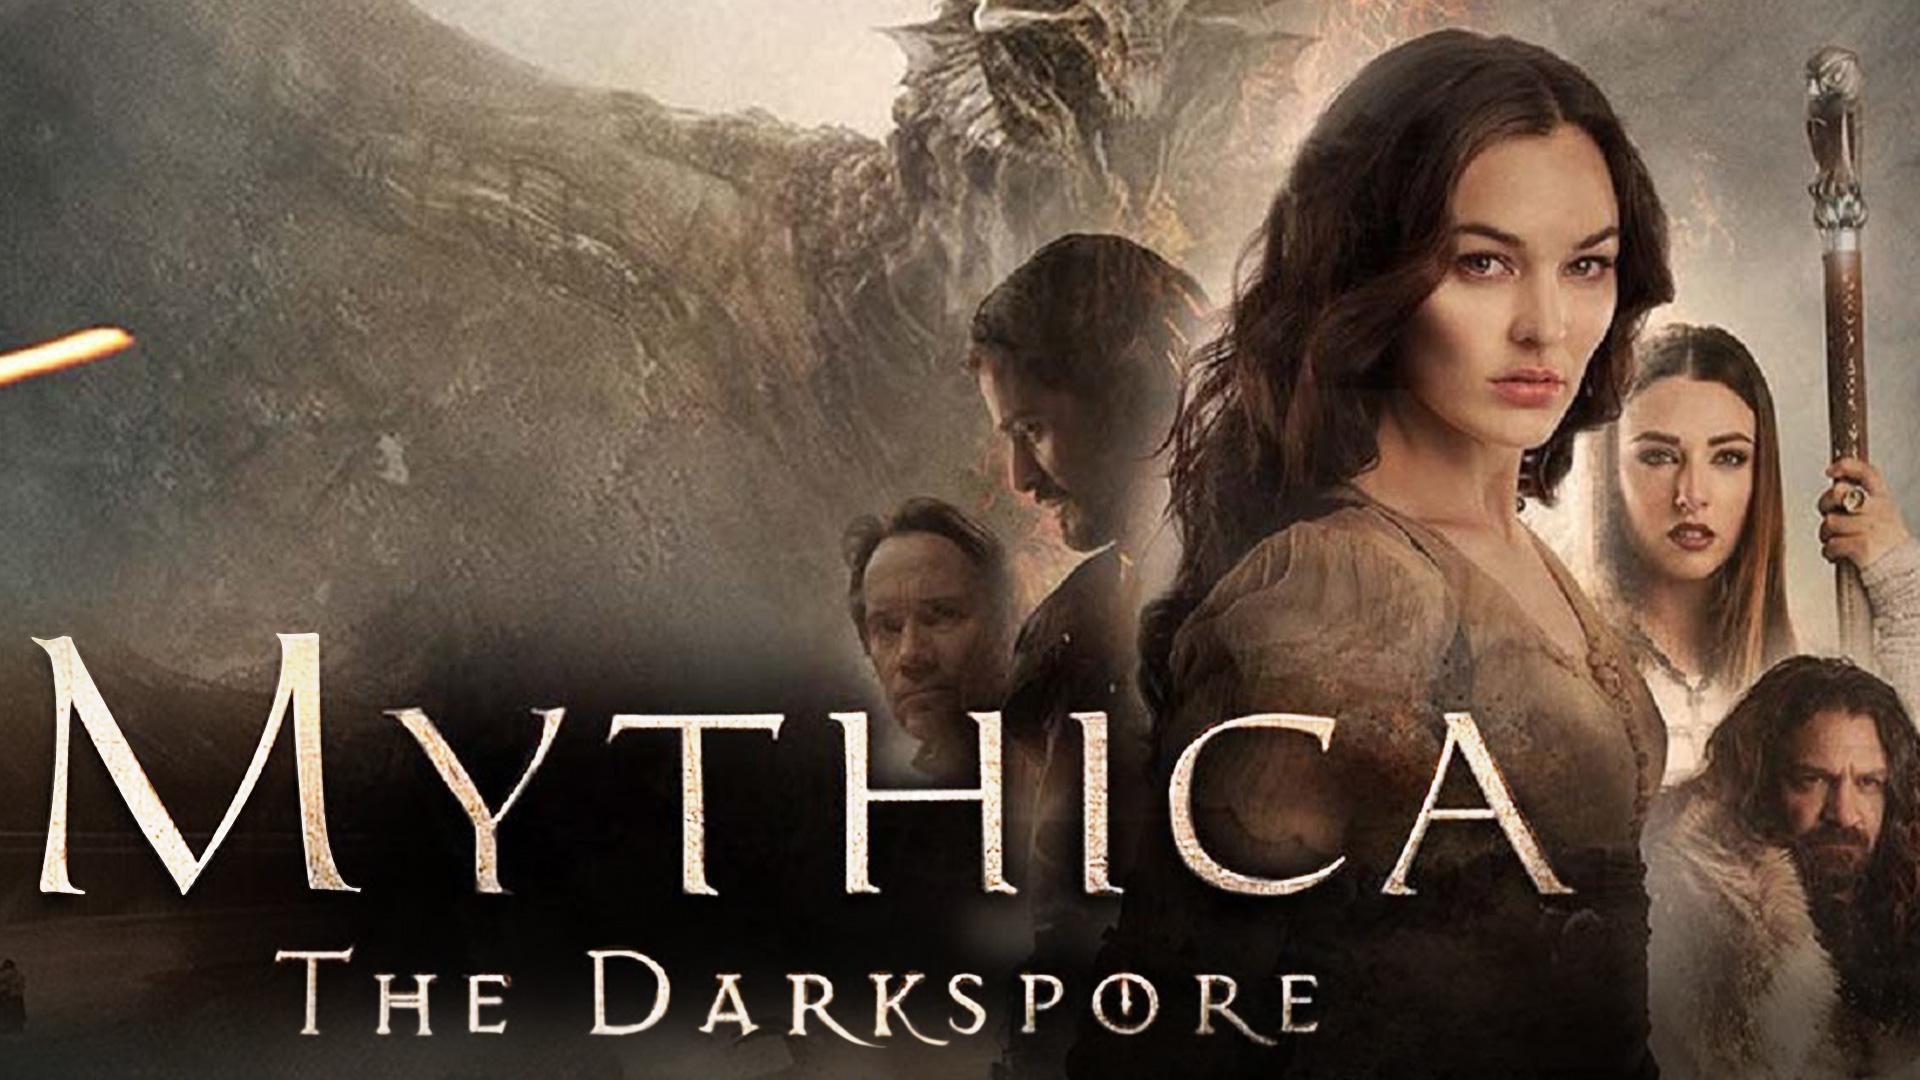 Mythica: The Darkspore on Amazon Prime Video UK